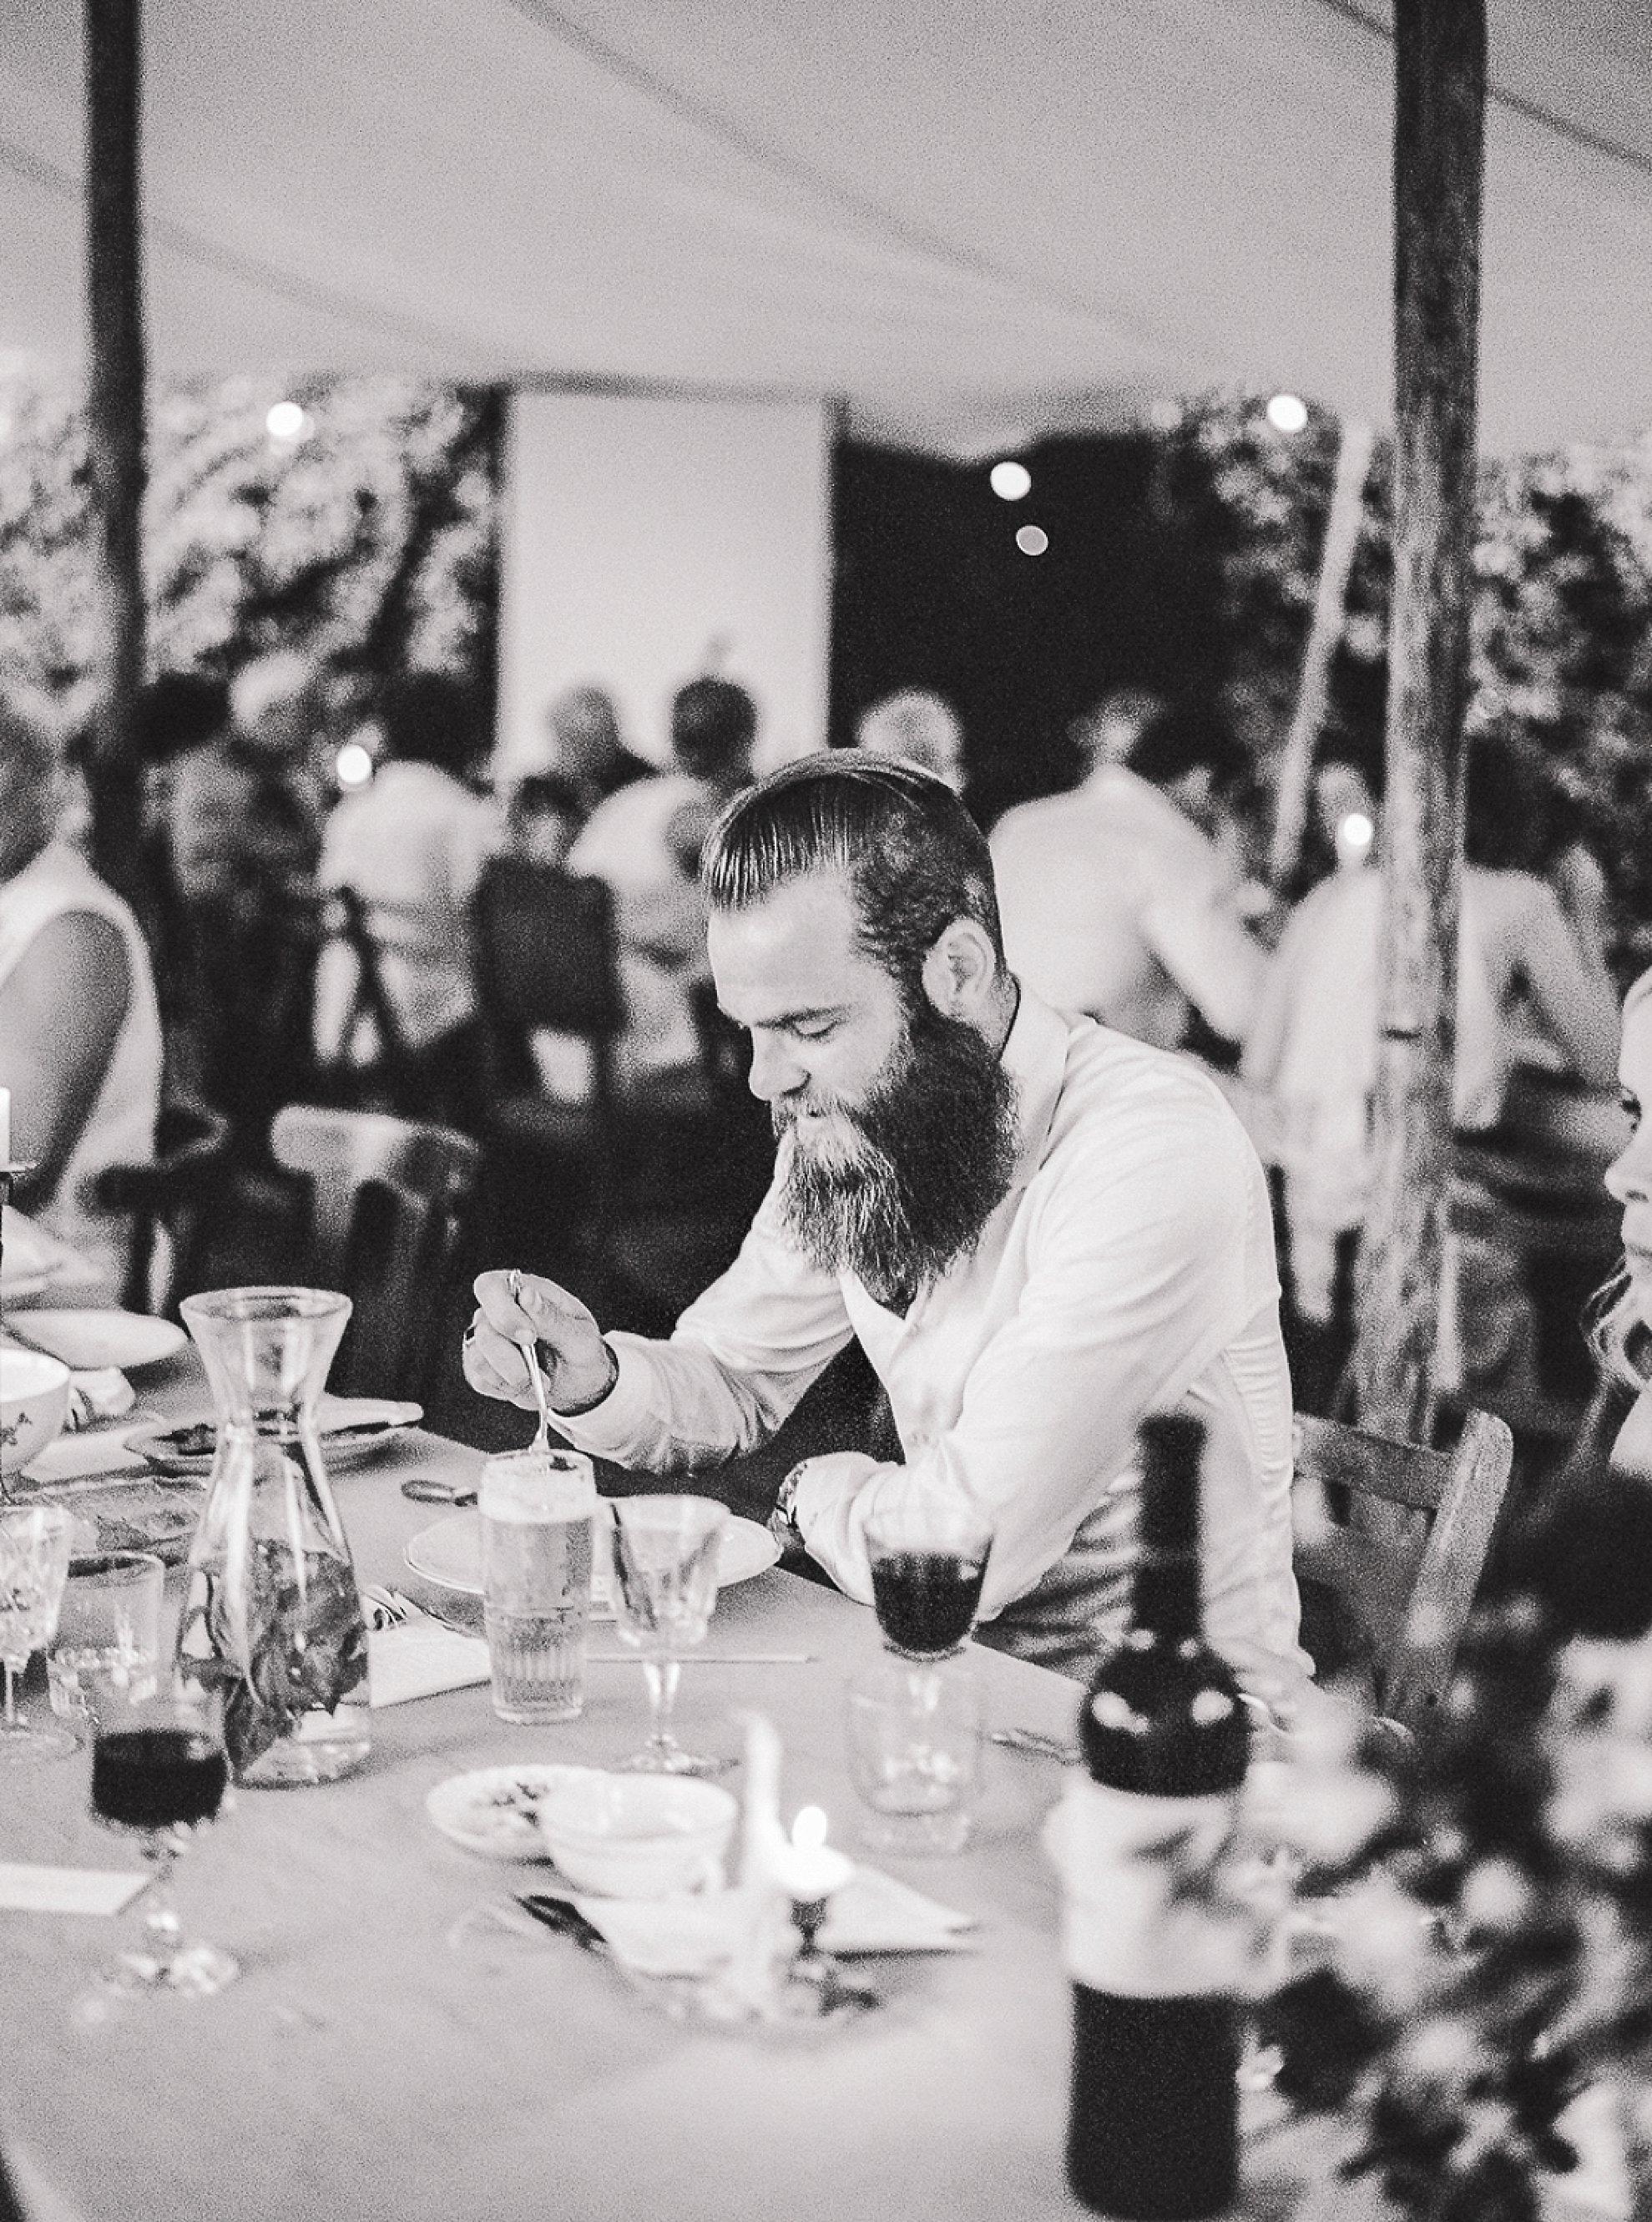 Amanda-Drost-Fotografie-Belgie-Photography-Wedding_0011.jpg